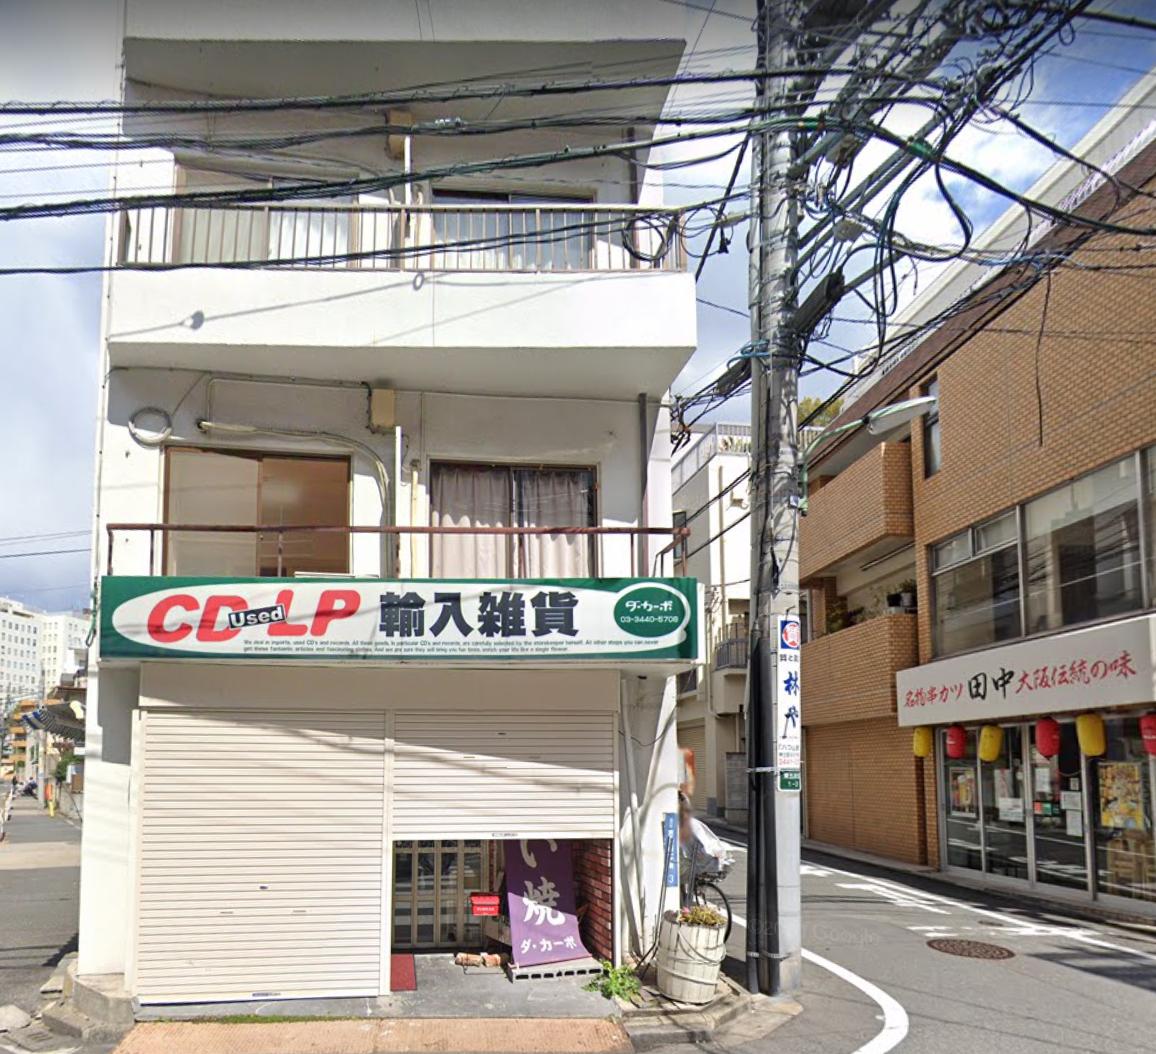 JR山手線【五反田駅】徒歩4分・視認性の高い好立地な1階路面店舗!五反田/スケルトン/飲食店